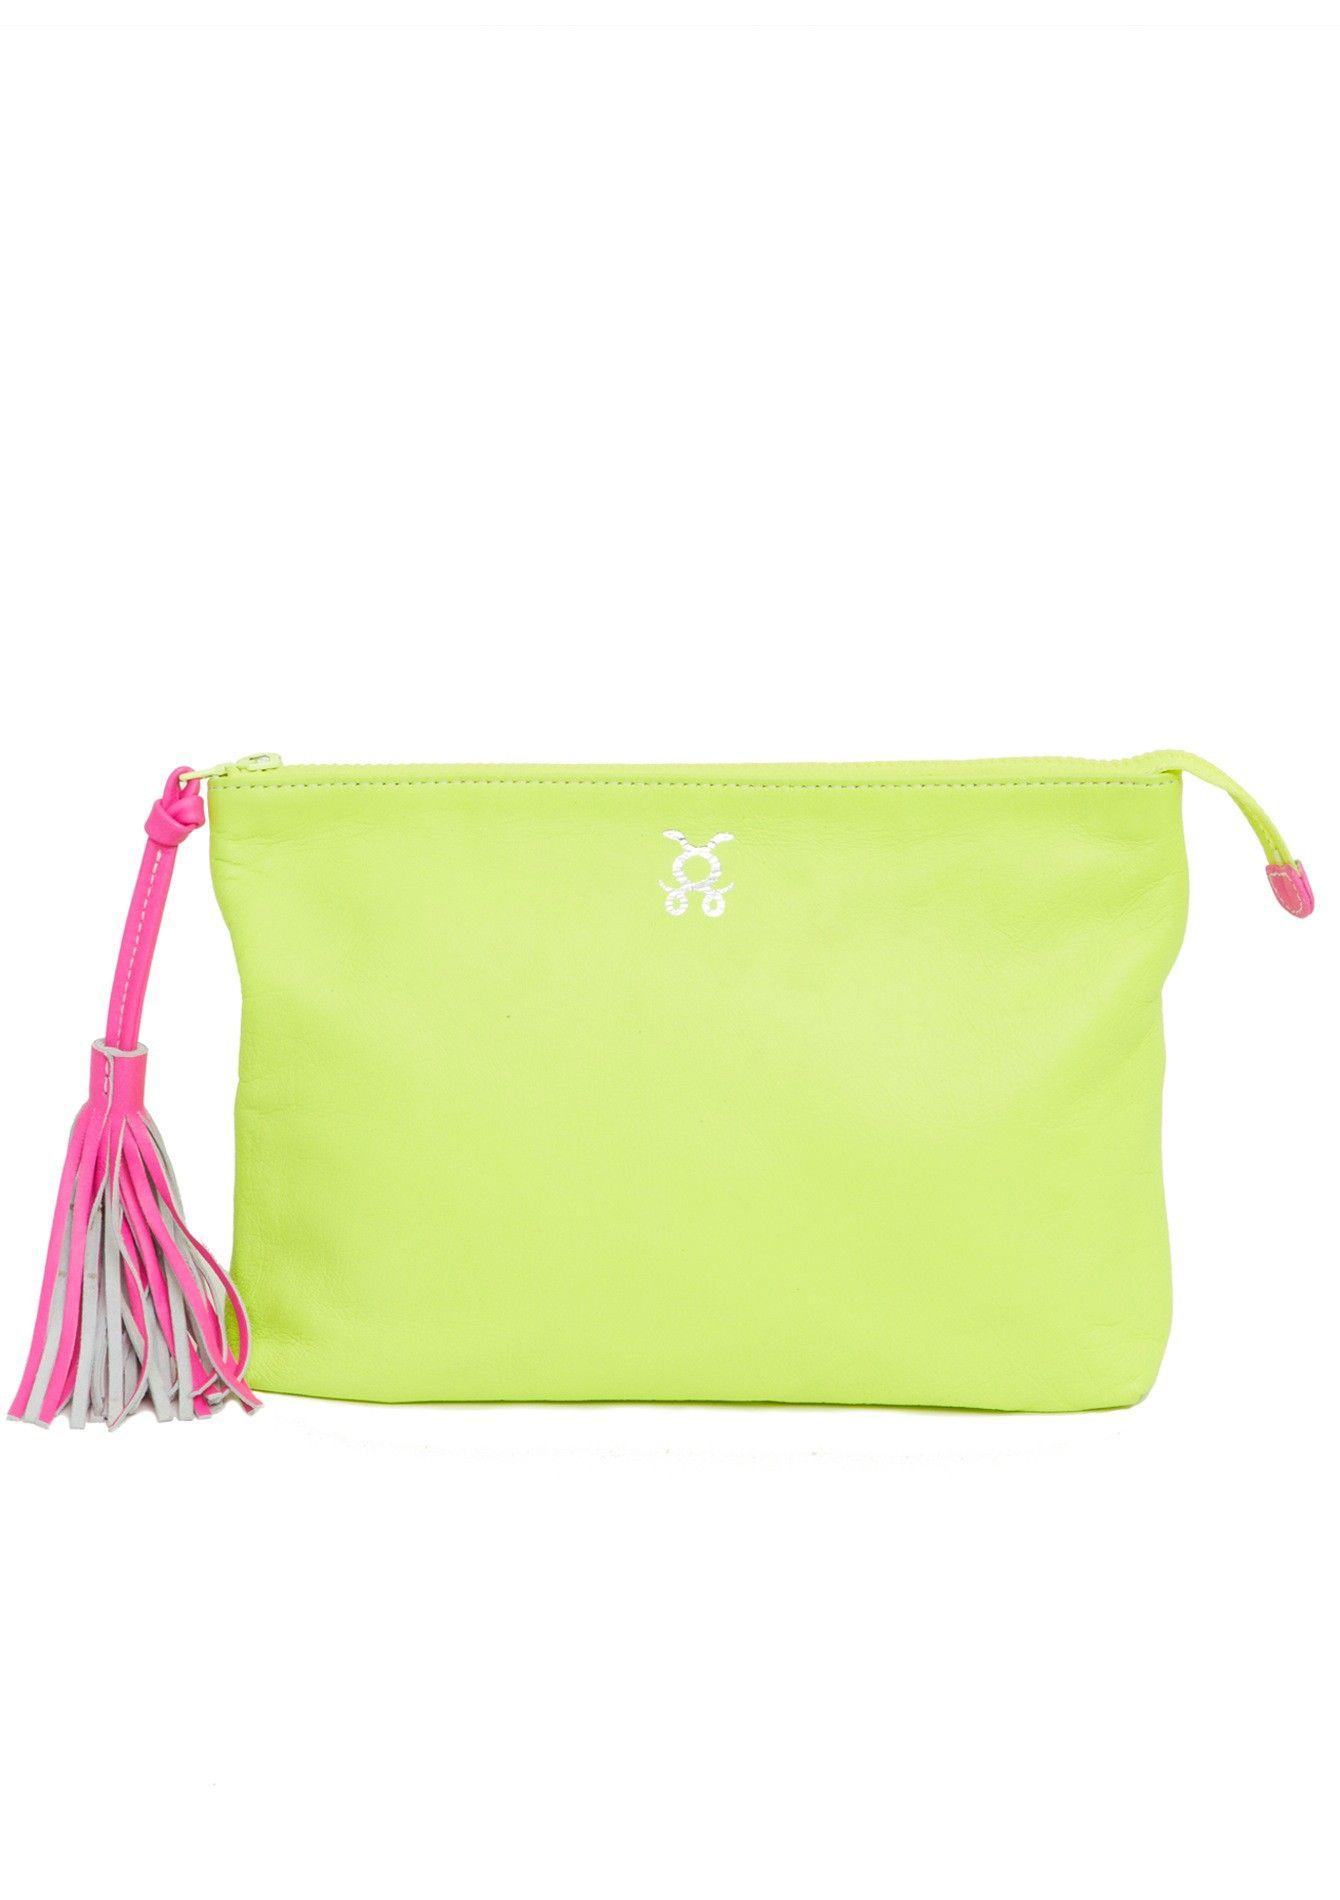 Neon Yellow Pouch Couture Handbagsprada Handbagsburberry Handbagsdesigner